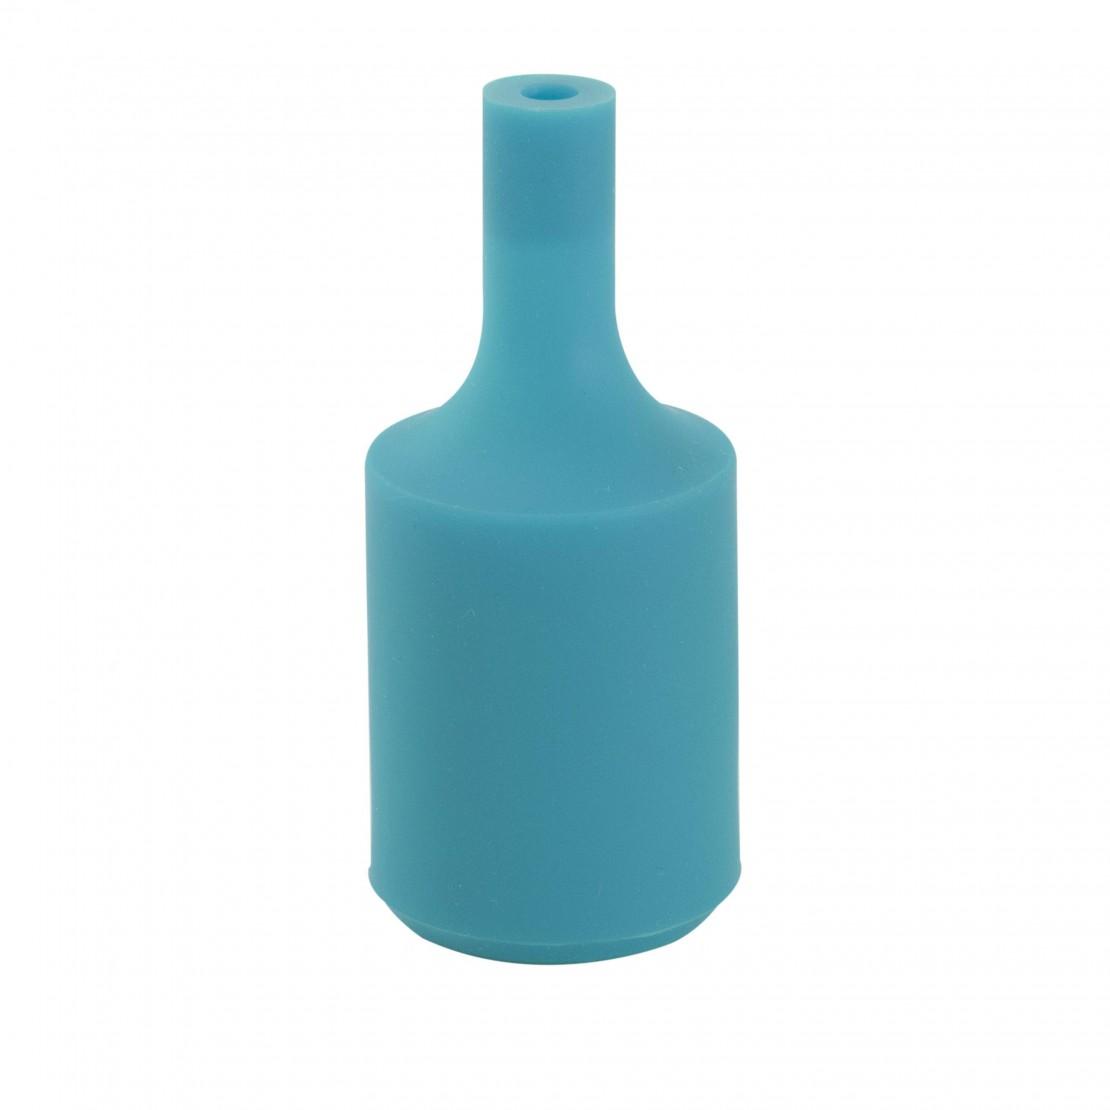 Siliconen lamphouder- pauw blauw